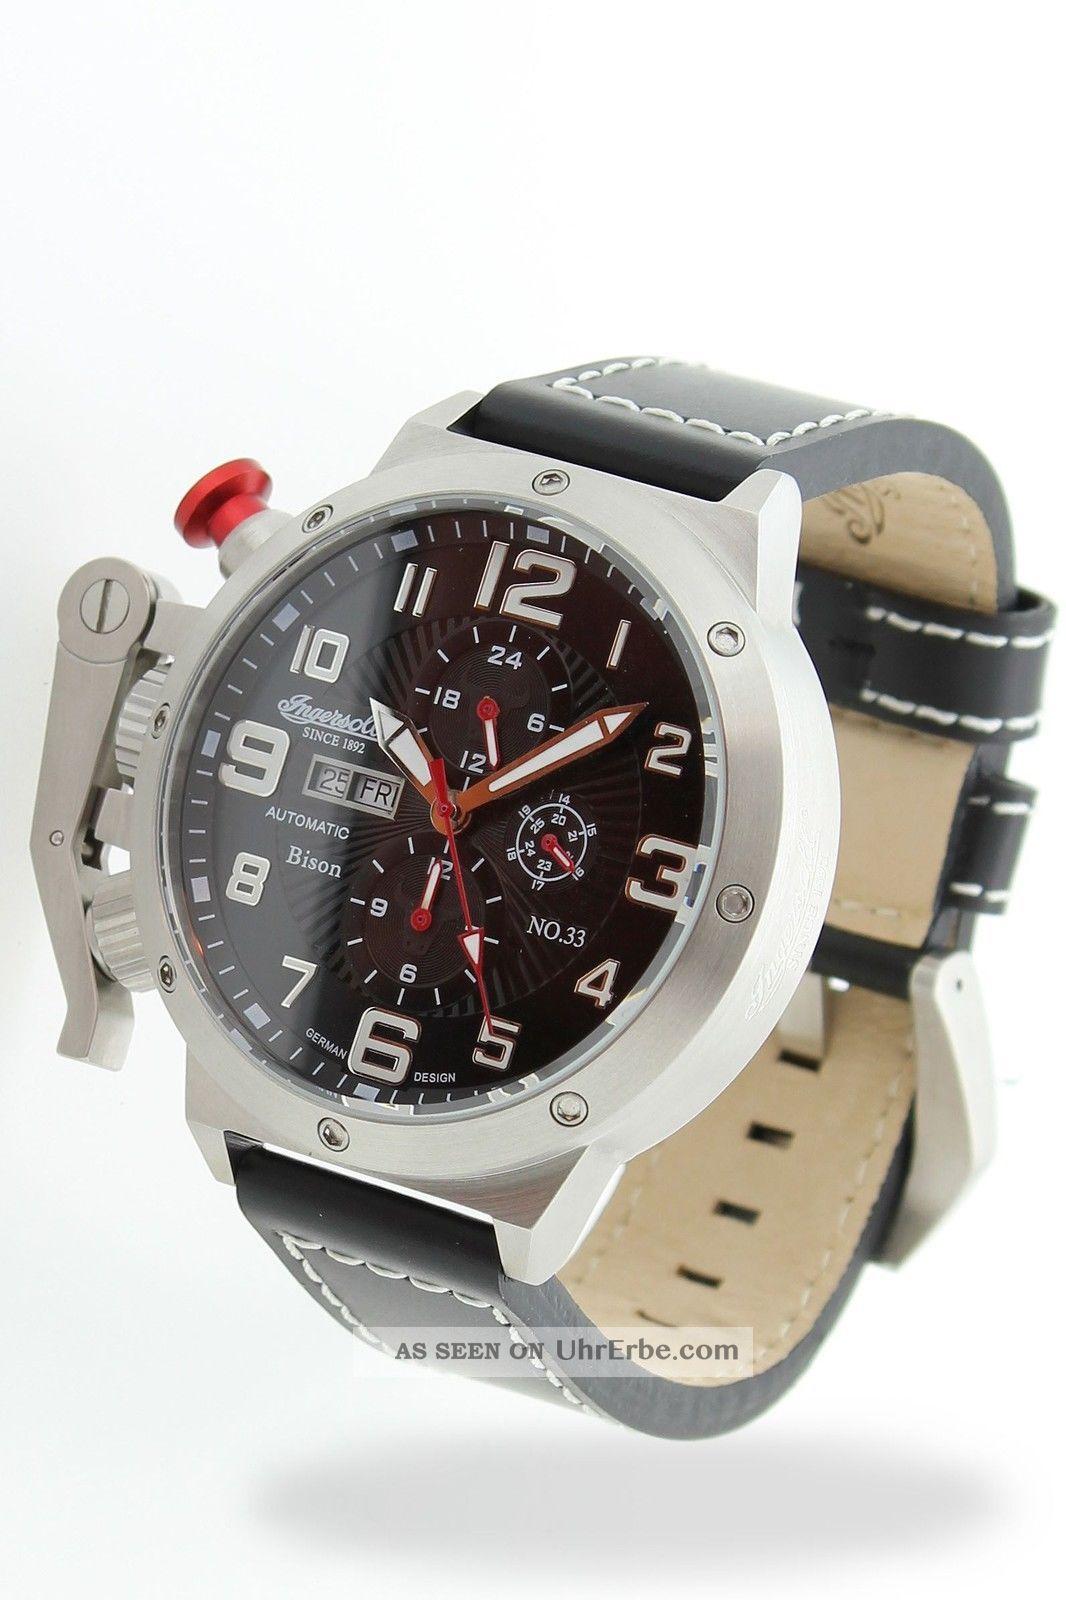 Ingersoll - Bison N0.  33 - In1629bkwh Herrenarmbanduhr Armbanduhren Bild